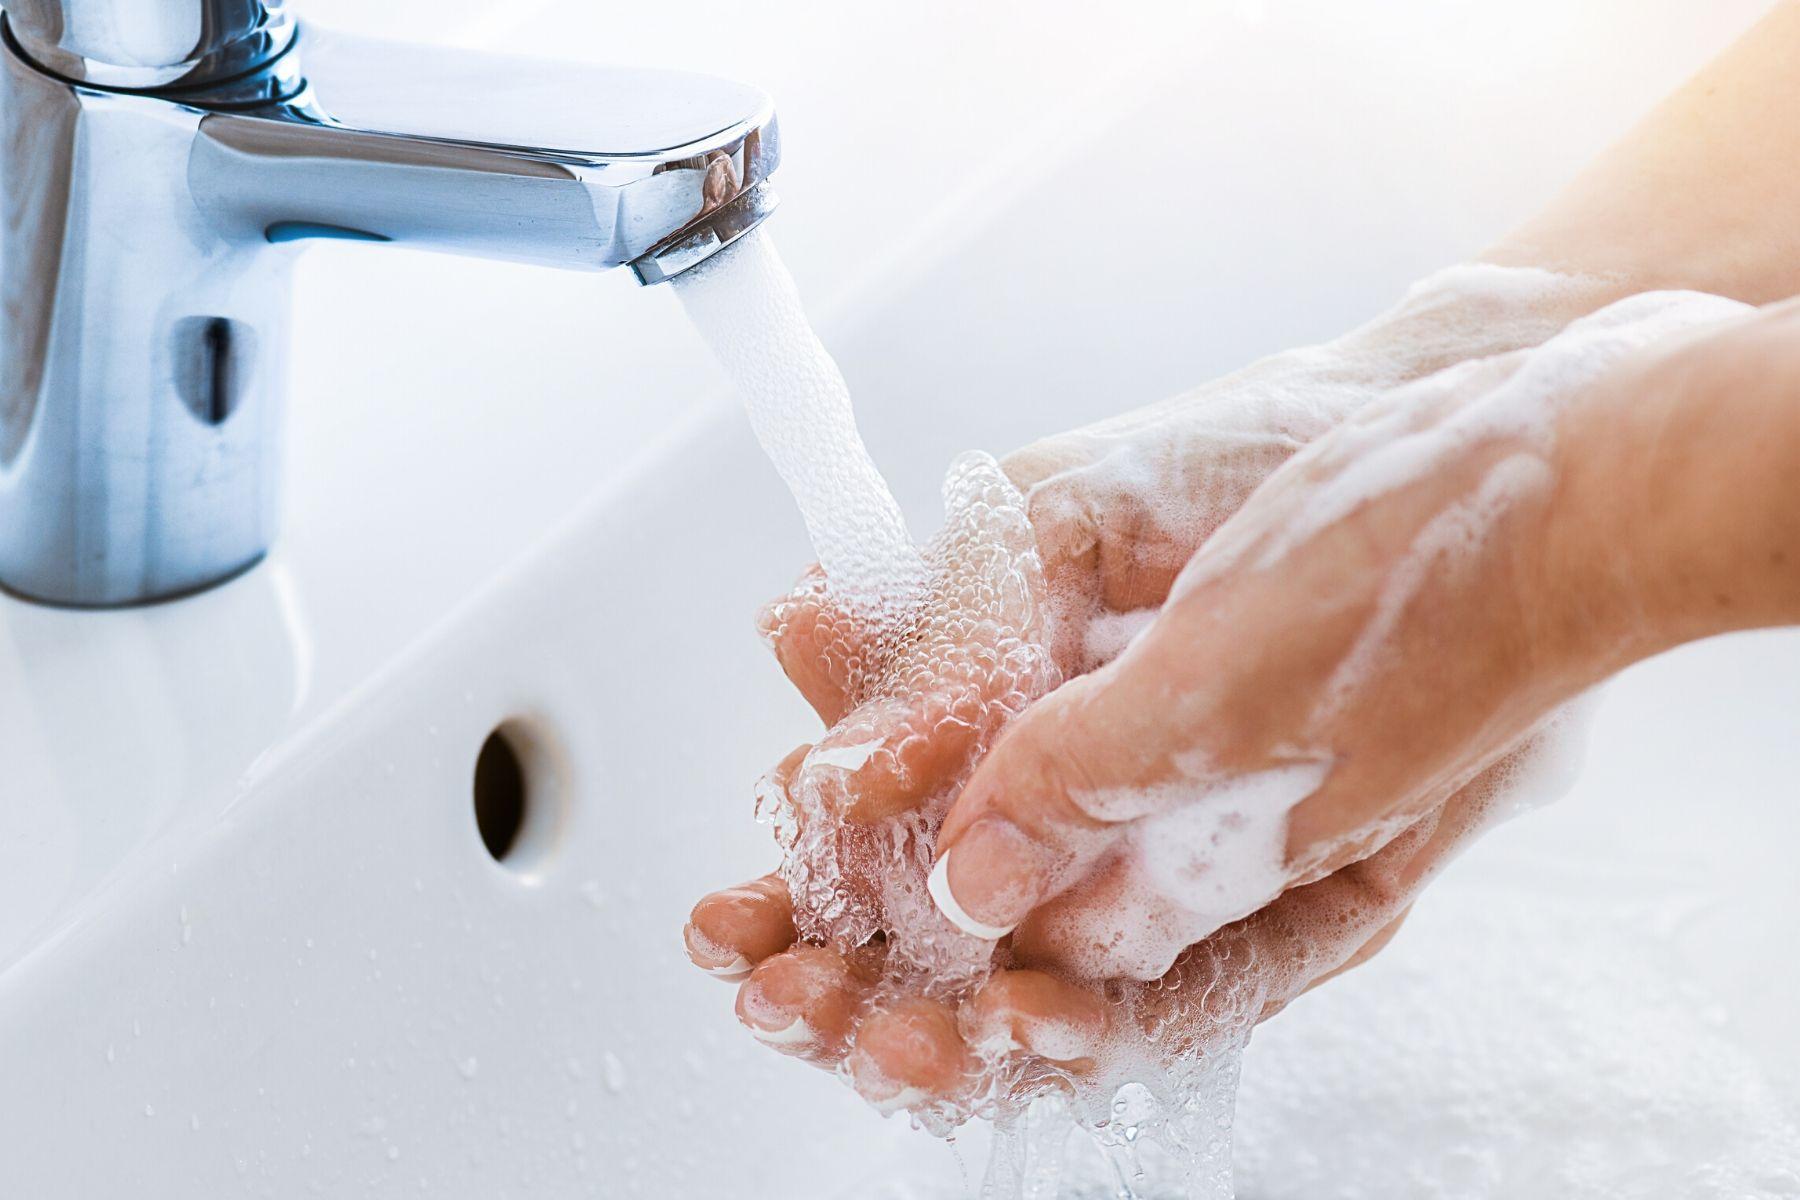 HappyFresh_Regulations_New_Normal_Washing